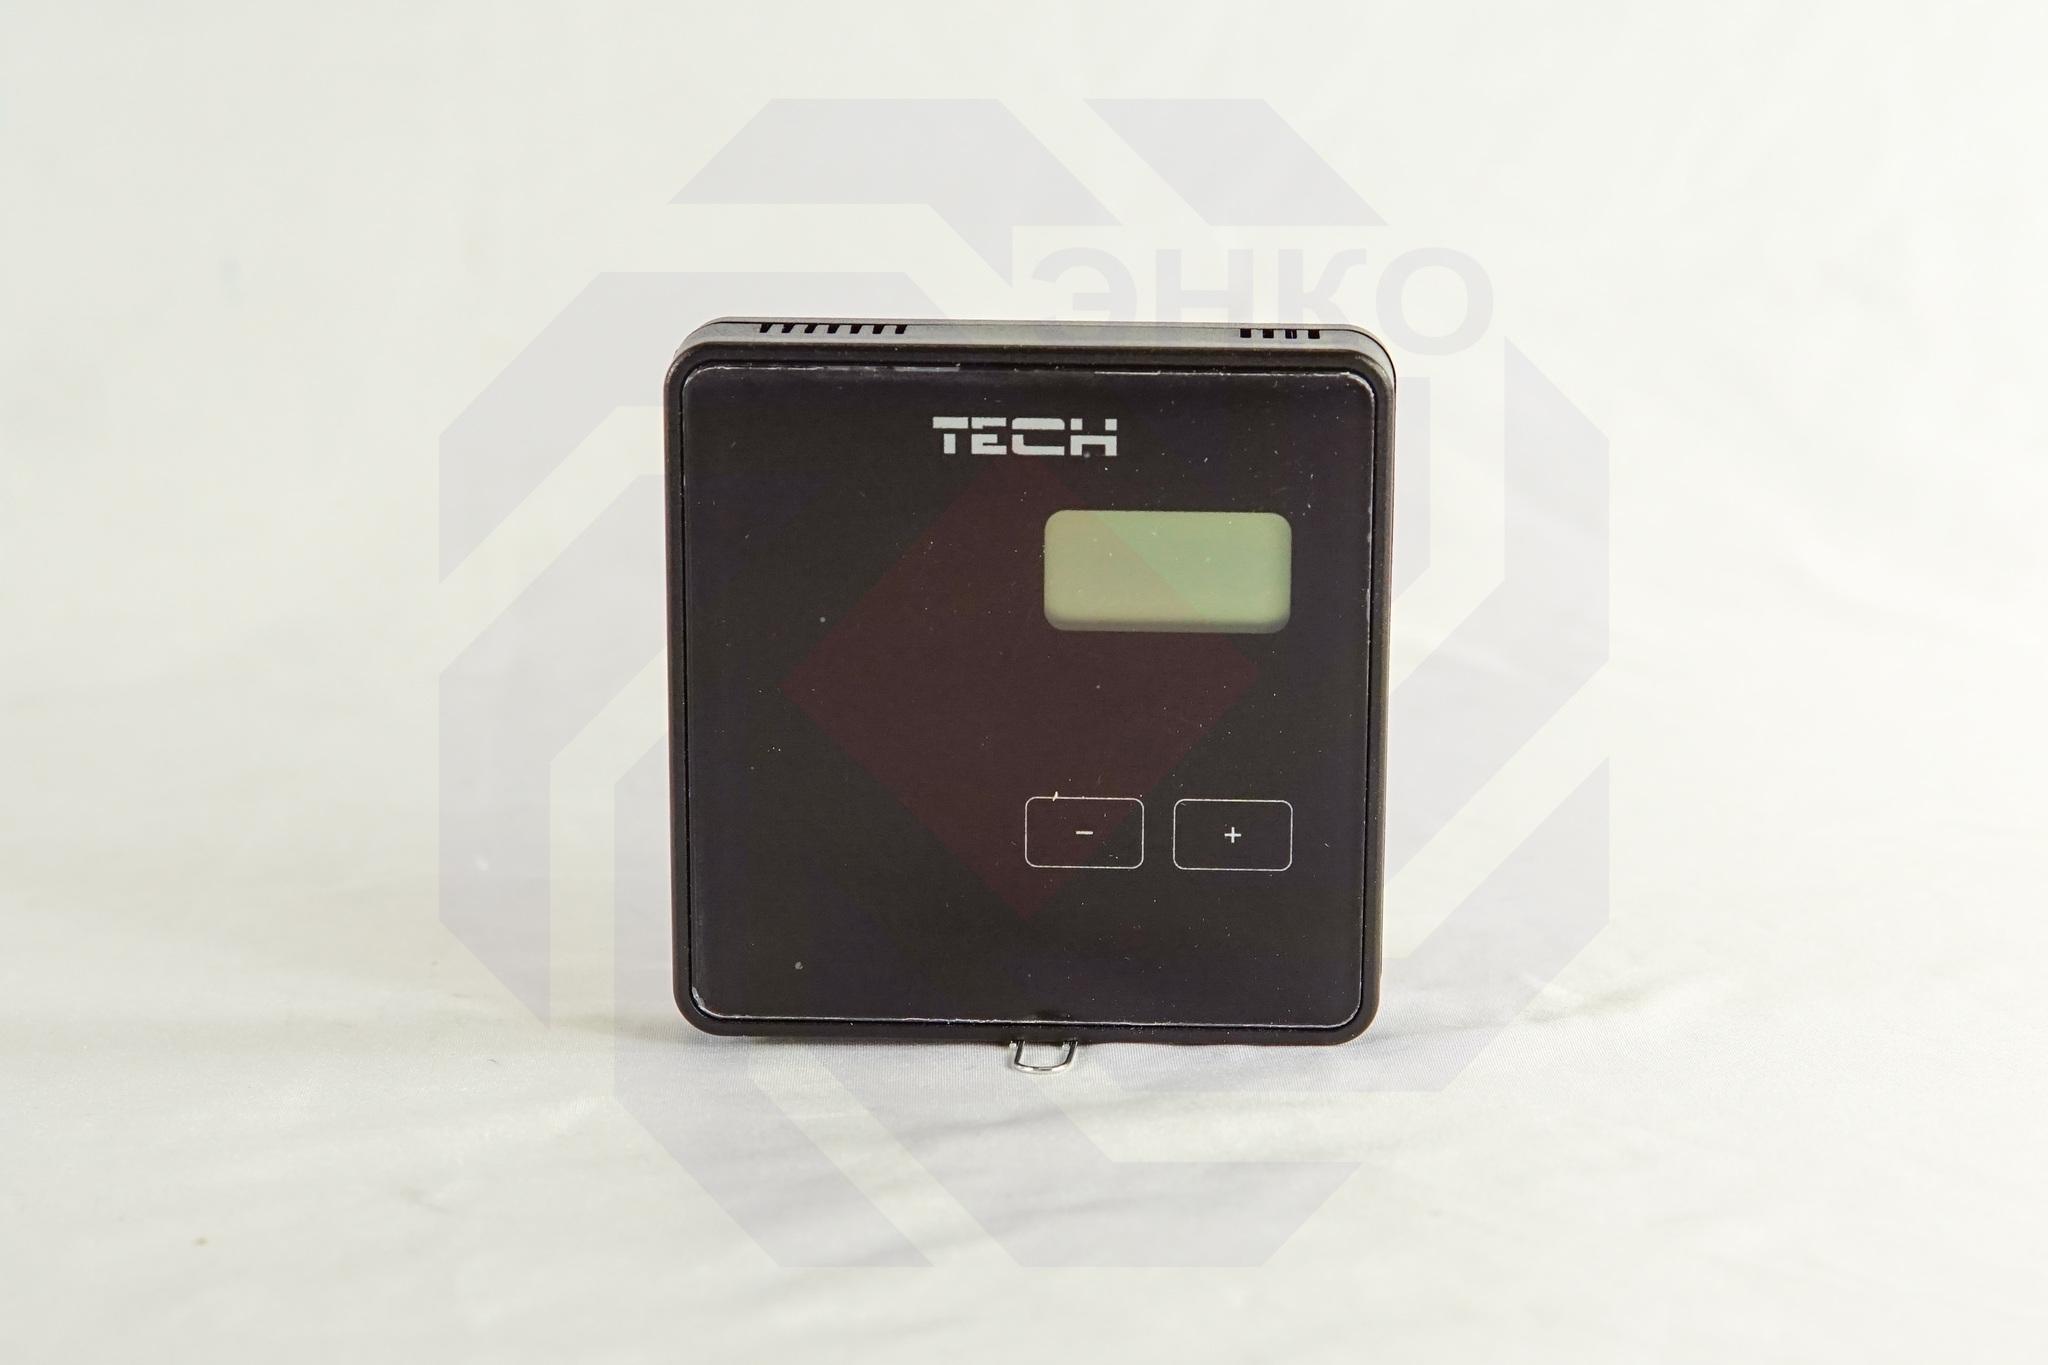 Термостат комнатный TECH STEROWNIKI ST-294 V2 черный